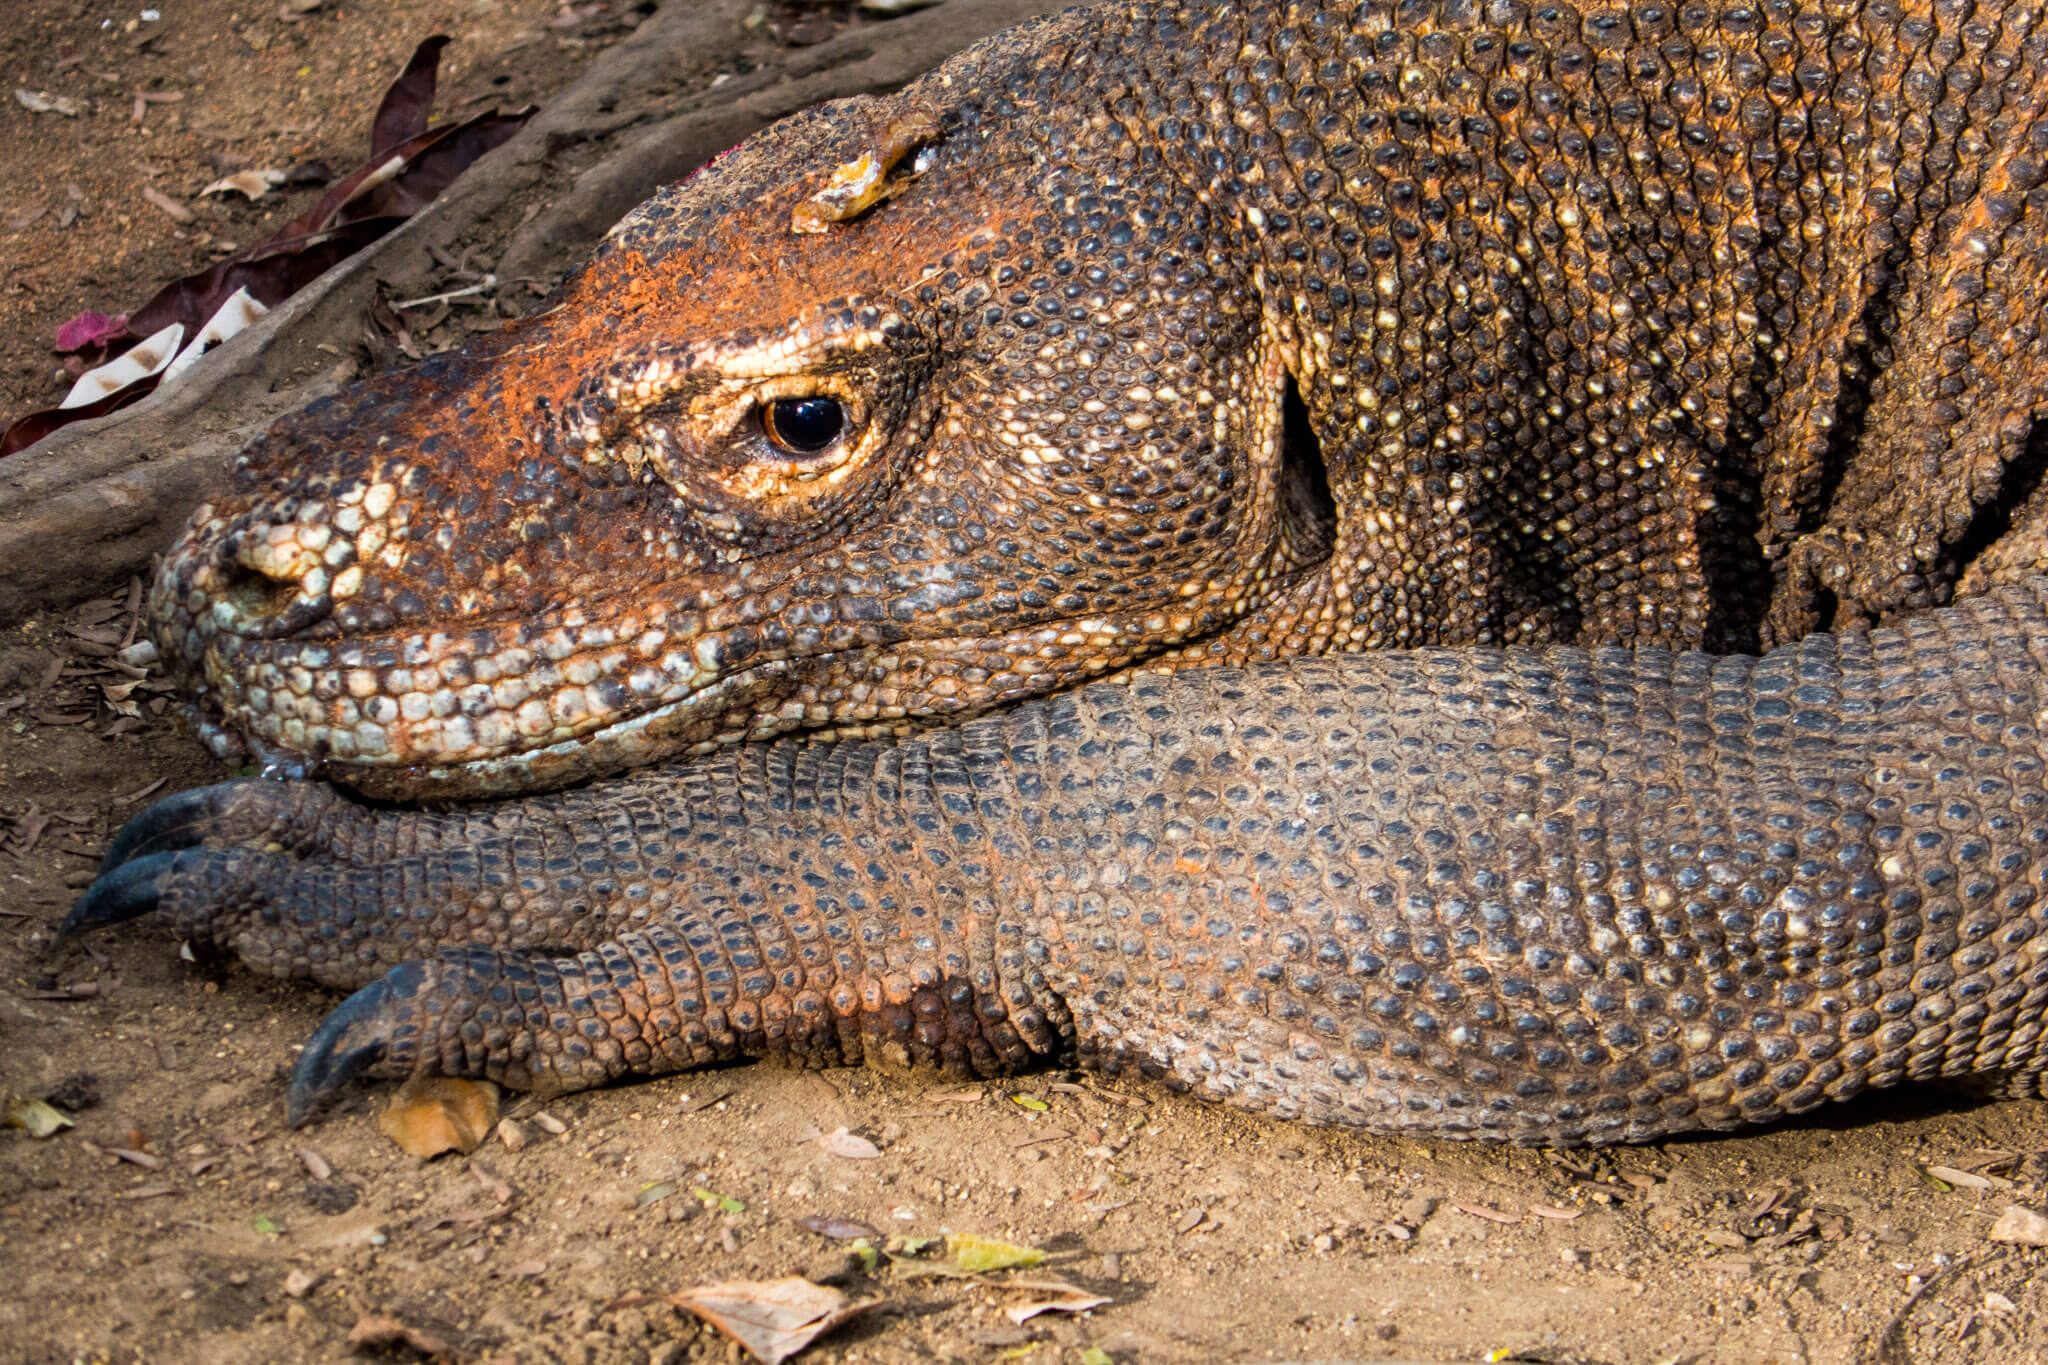 A Komodo dragon resting in Rinca Island. Komodo National Park